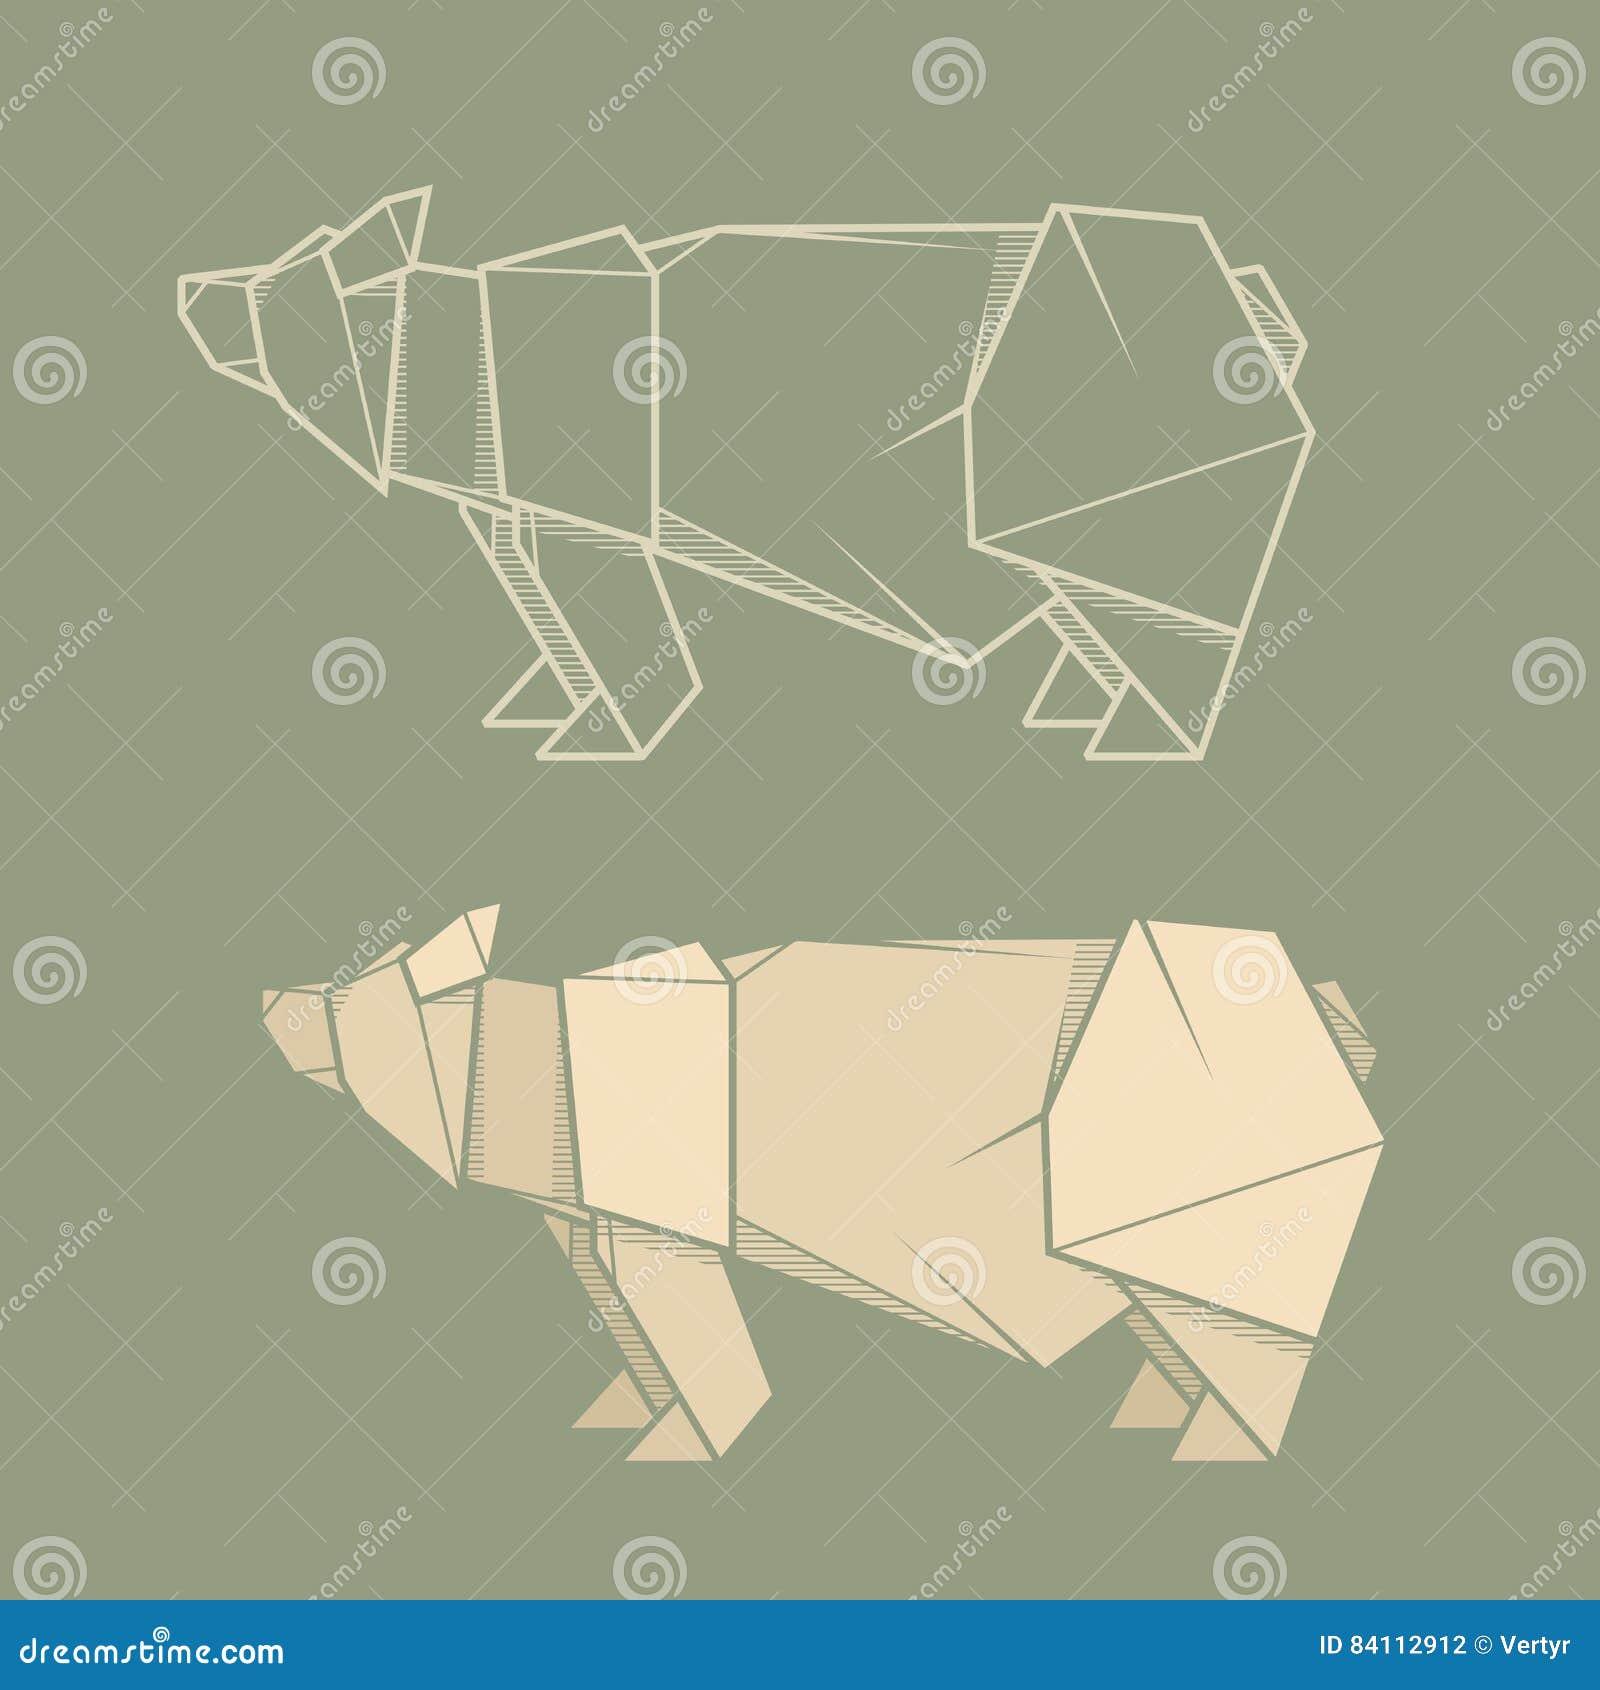 Brilliant Set Illustration Paper Origami Of Bear Stock Vector Illustration Wiring 101 Olytiaxxcnl